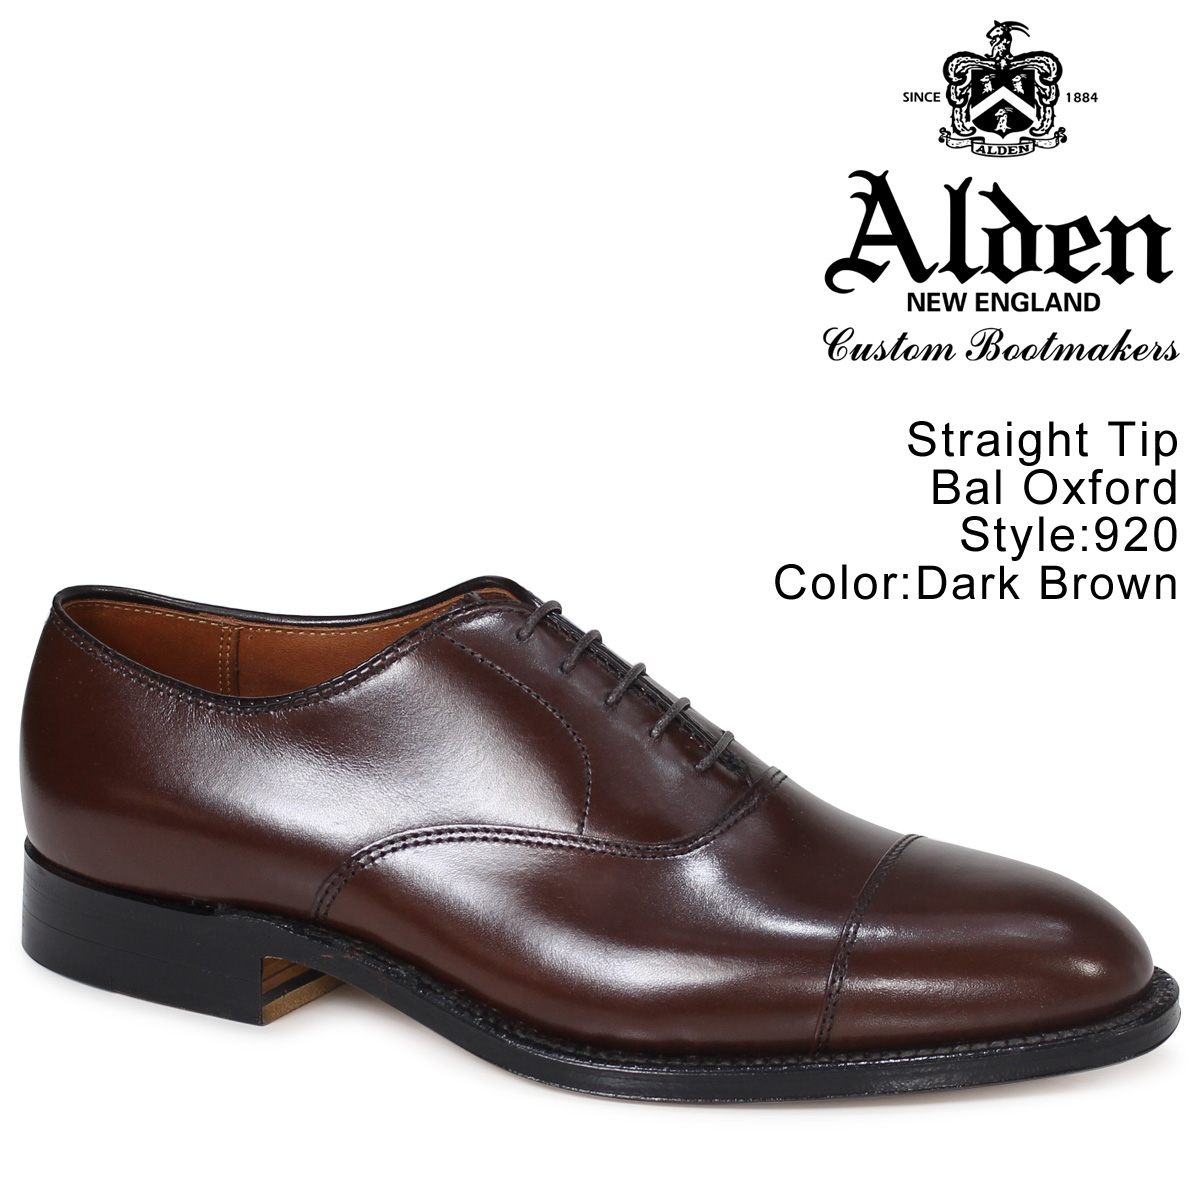 ALDEN オールデン オックスフォード シューズ メンズ STRAIGHT TIP BAL OXFORD Dワイズ 920